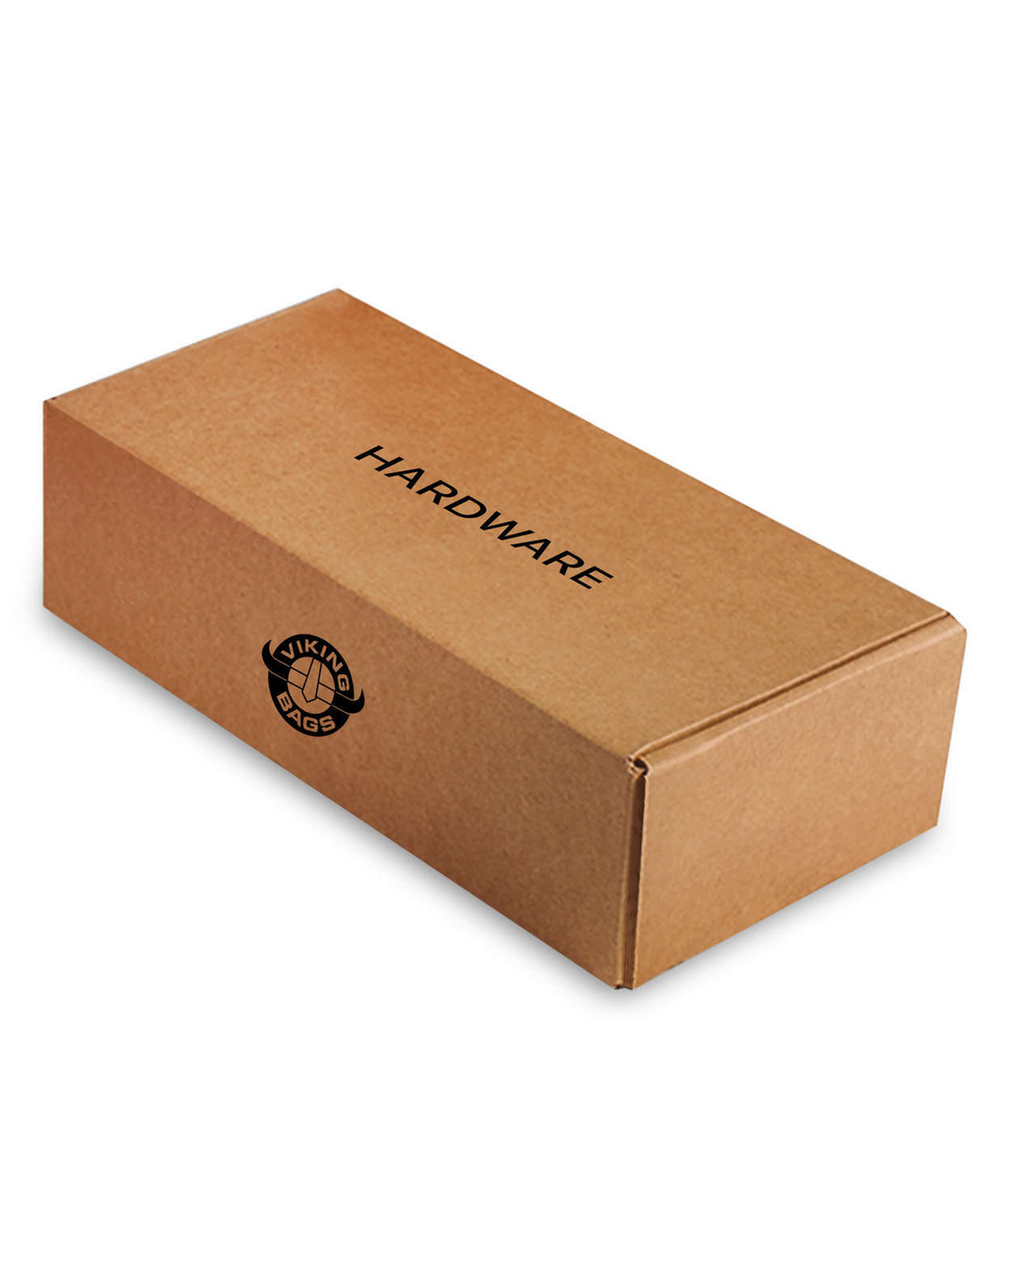 Triumph Rocket III Range Charger Single Strap Studded Medium Motorcycle Saddlebags Box